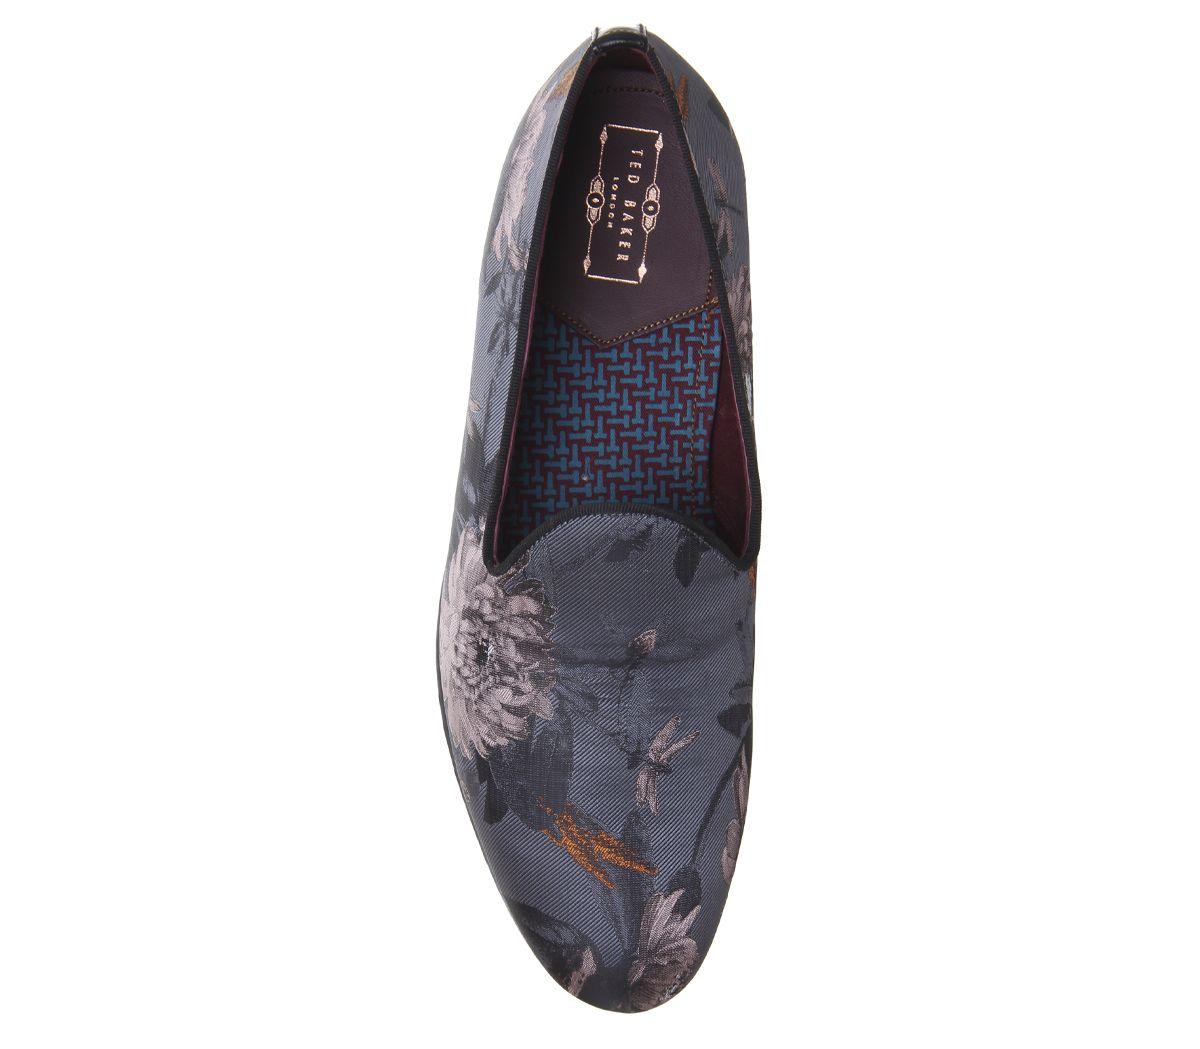 Mens Ted Baker Vihan Evening Slippers Grey Floral Formal Shoes